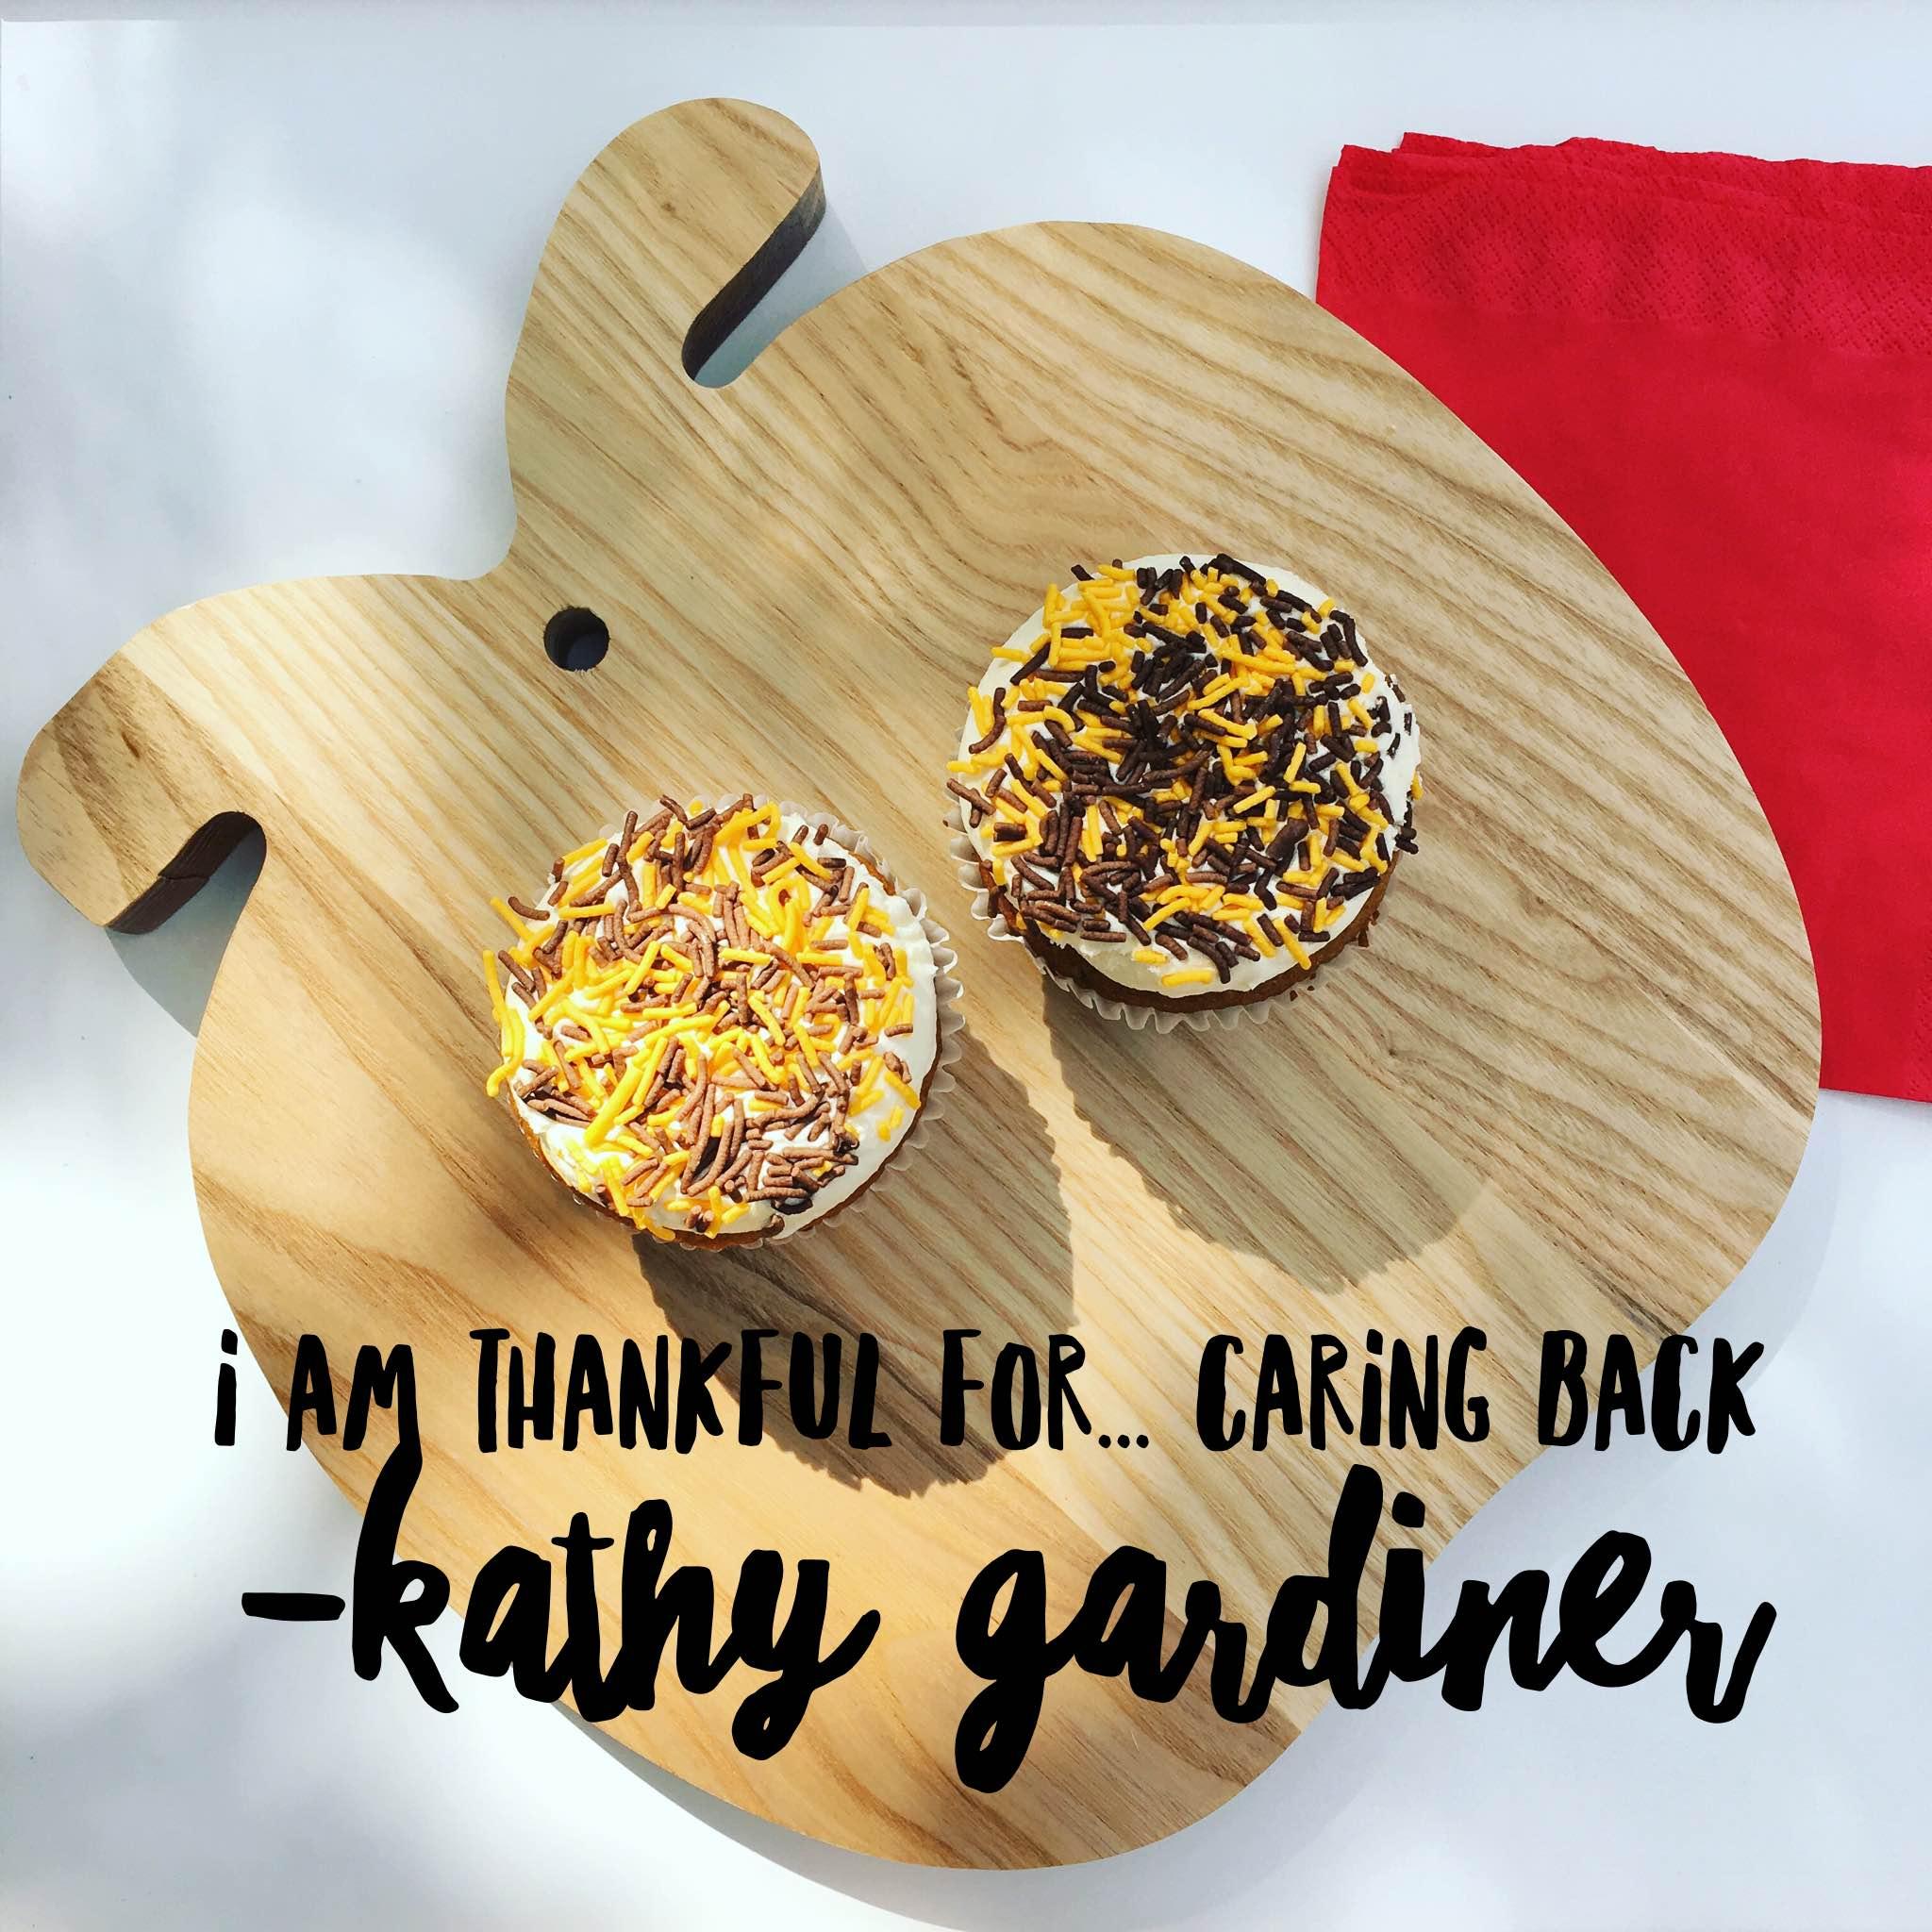 thankful-thursdays-caring-back-the-naked-gardiner-kathy-gardiner